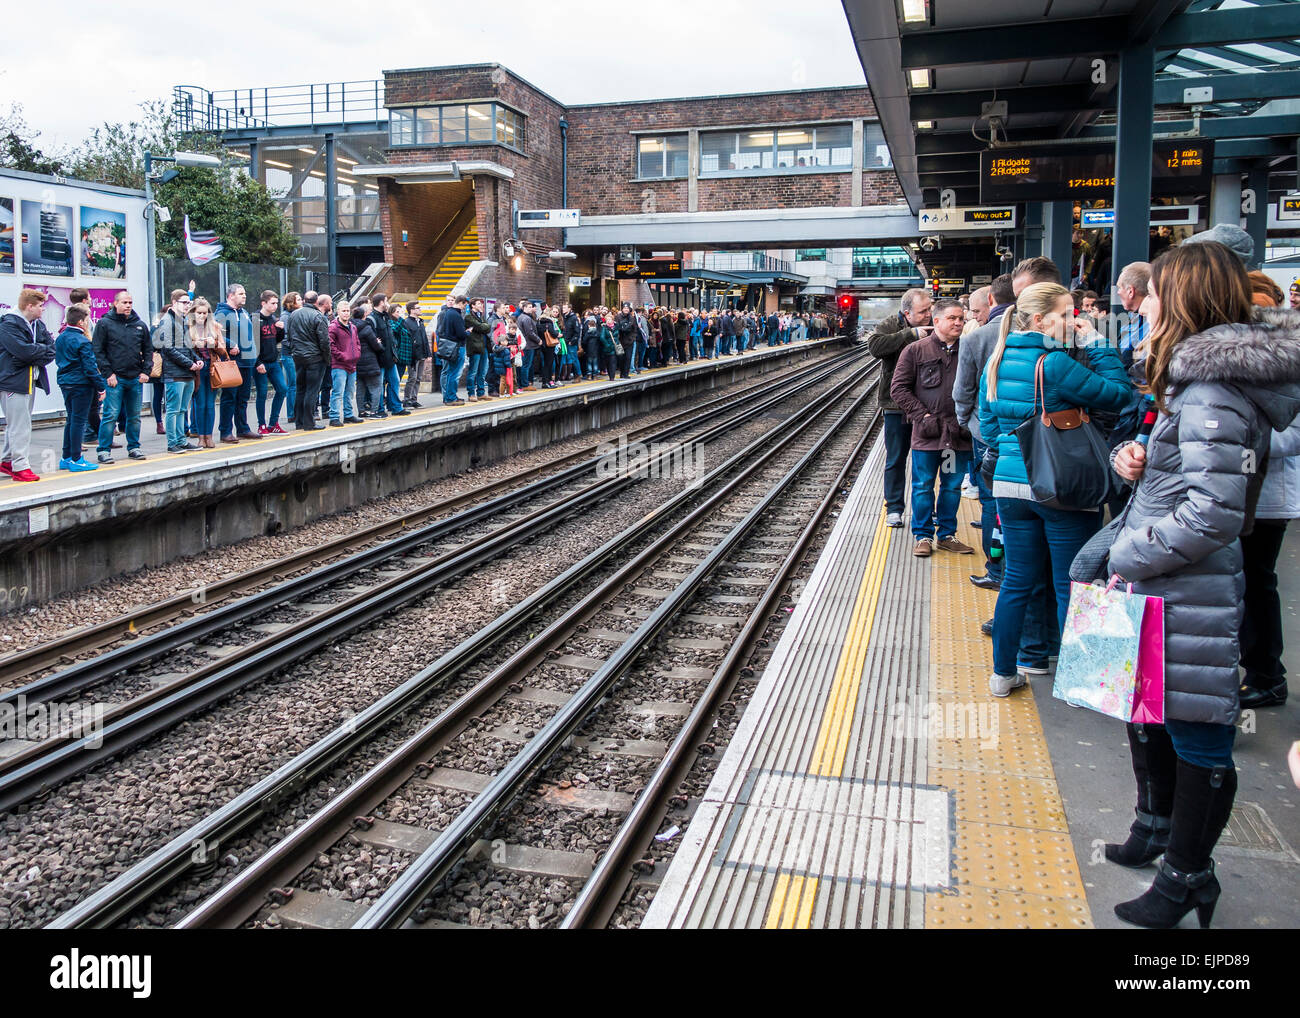 Large Crowd waiting for tube train. Wembley Park Station - Stock Image